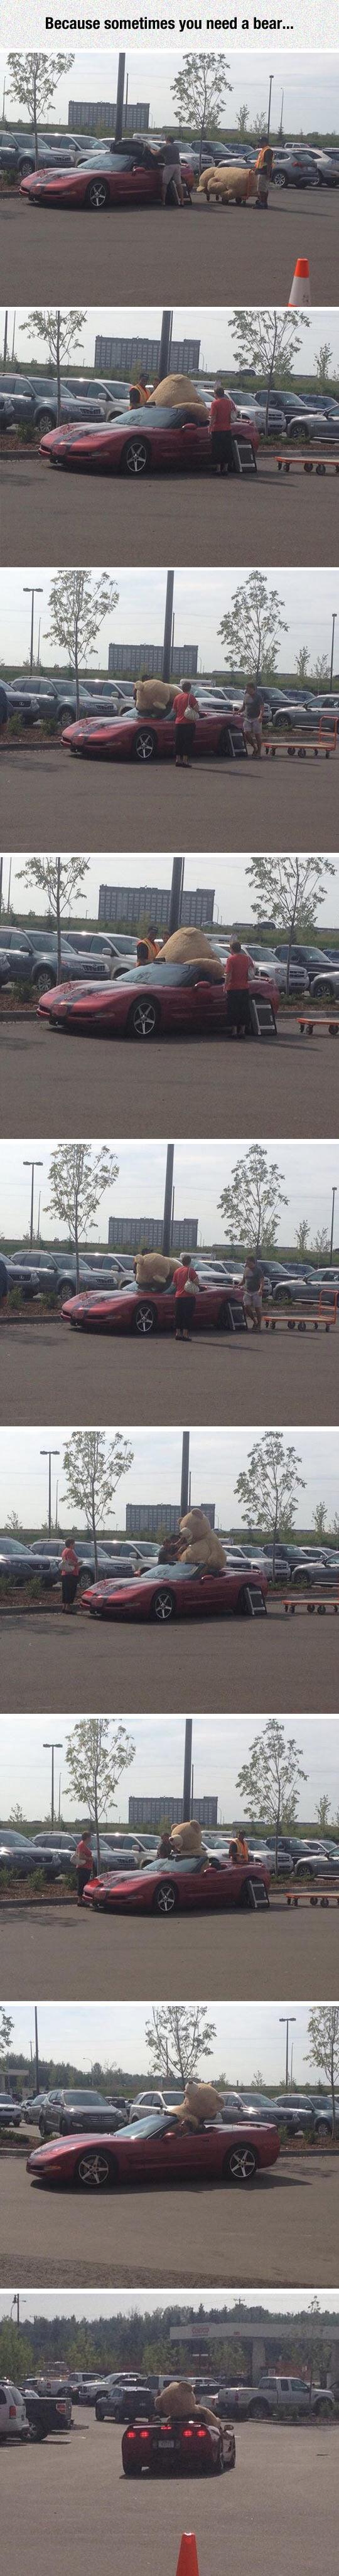 cool-man-teddy-bear-car